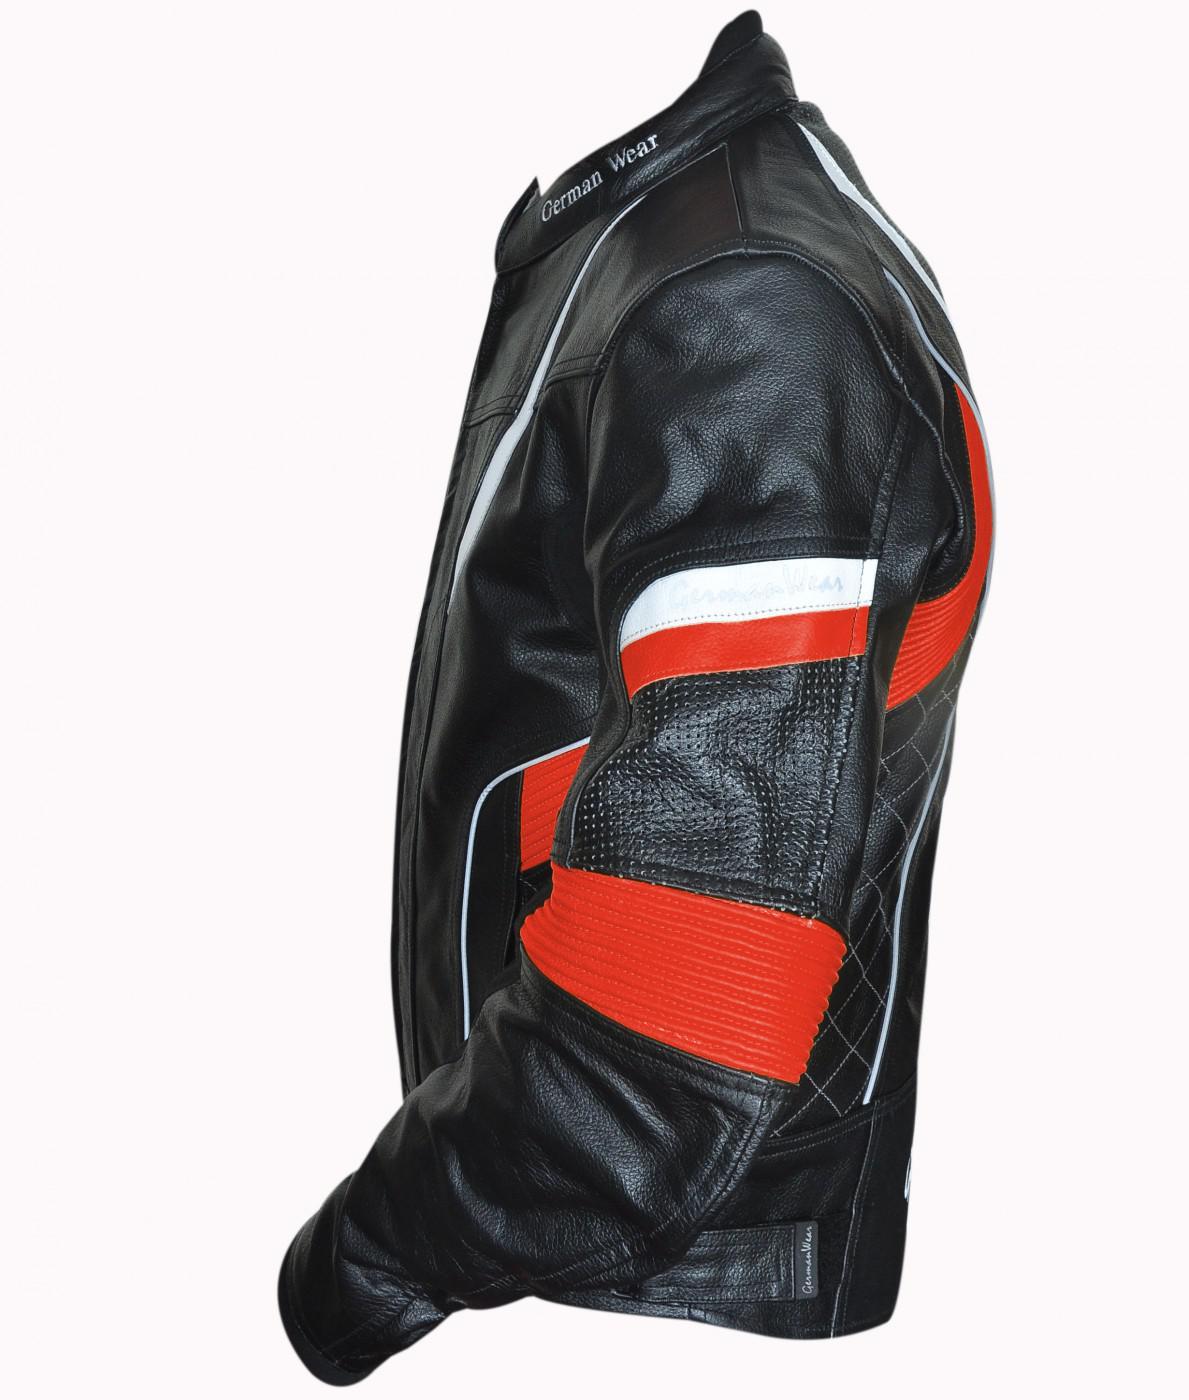 Motorradjacke Lederjacke Chopperjacke Cruiser Jacke 4x